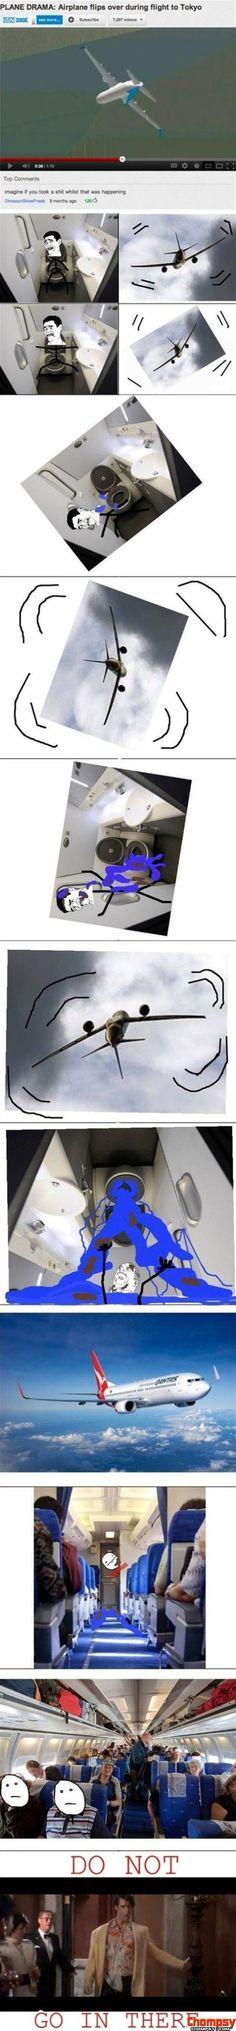 Plane Drama